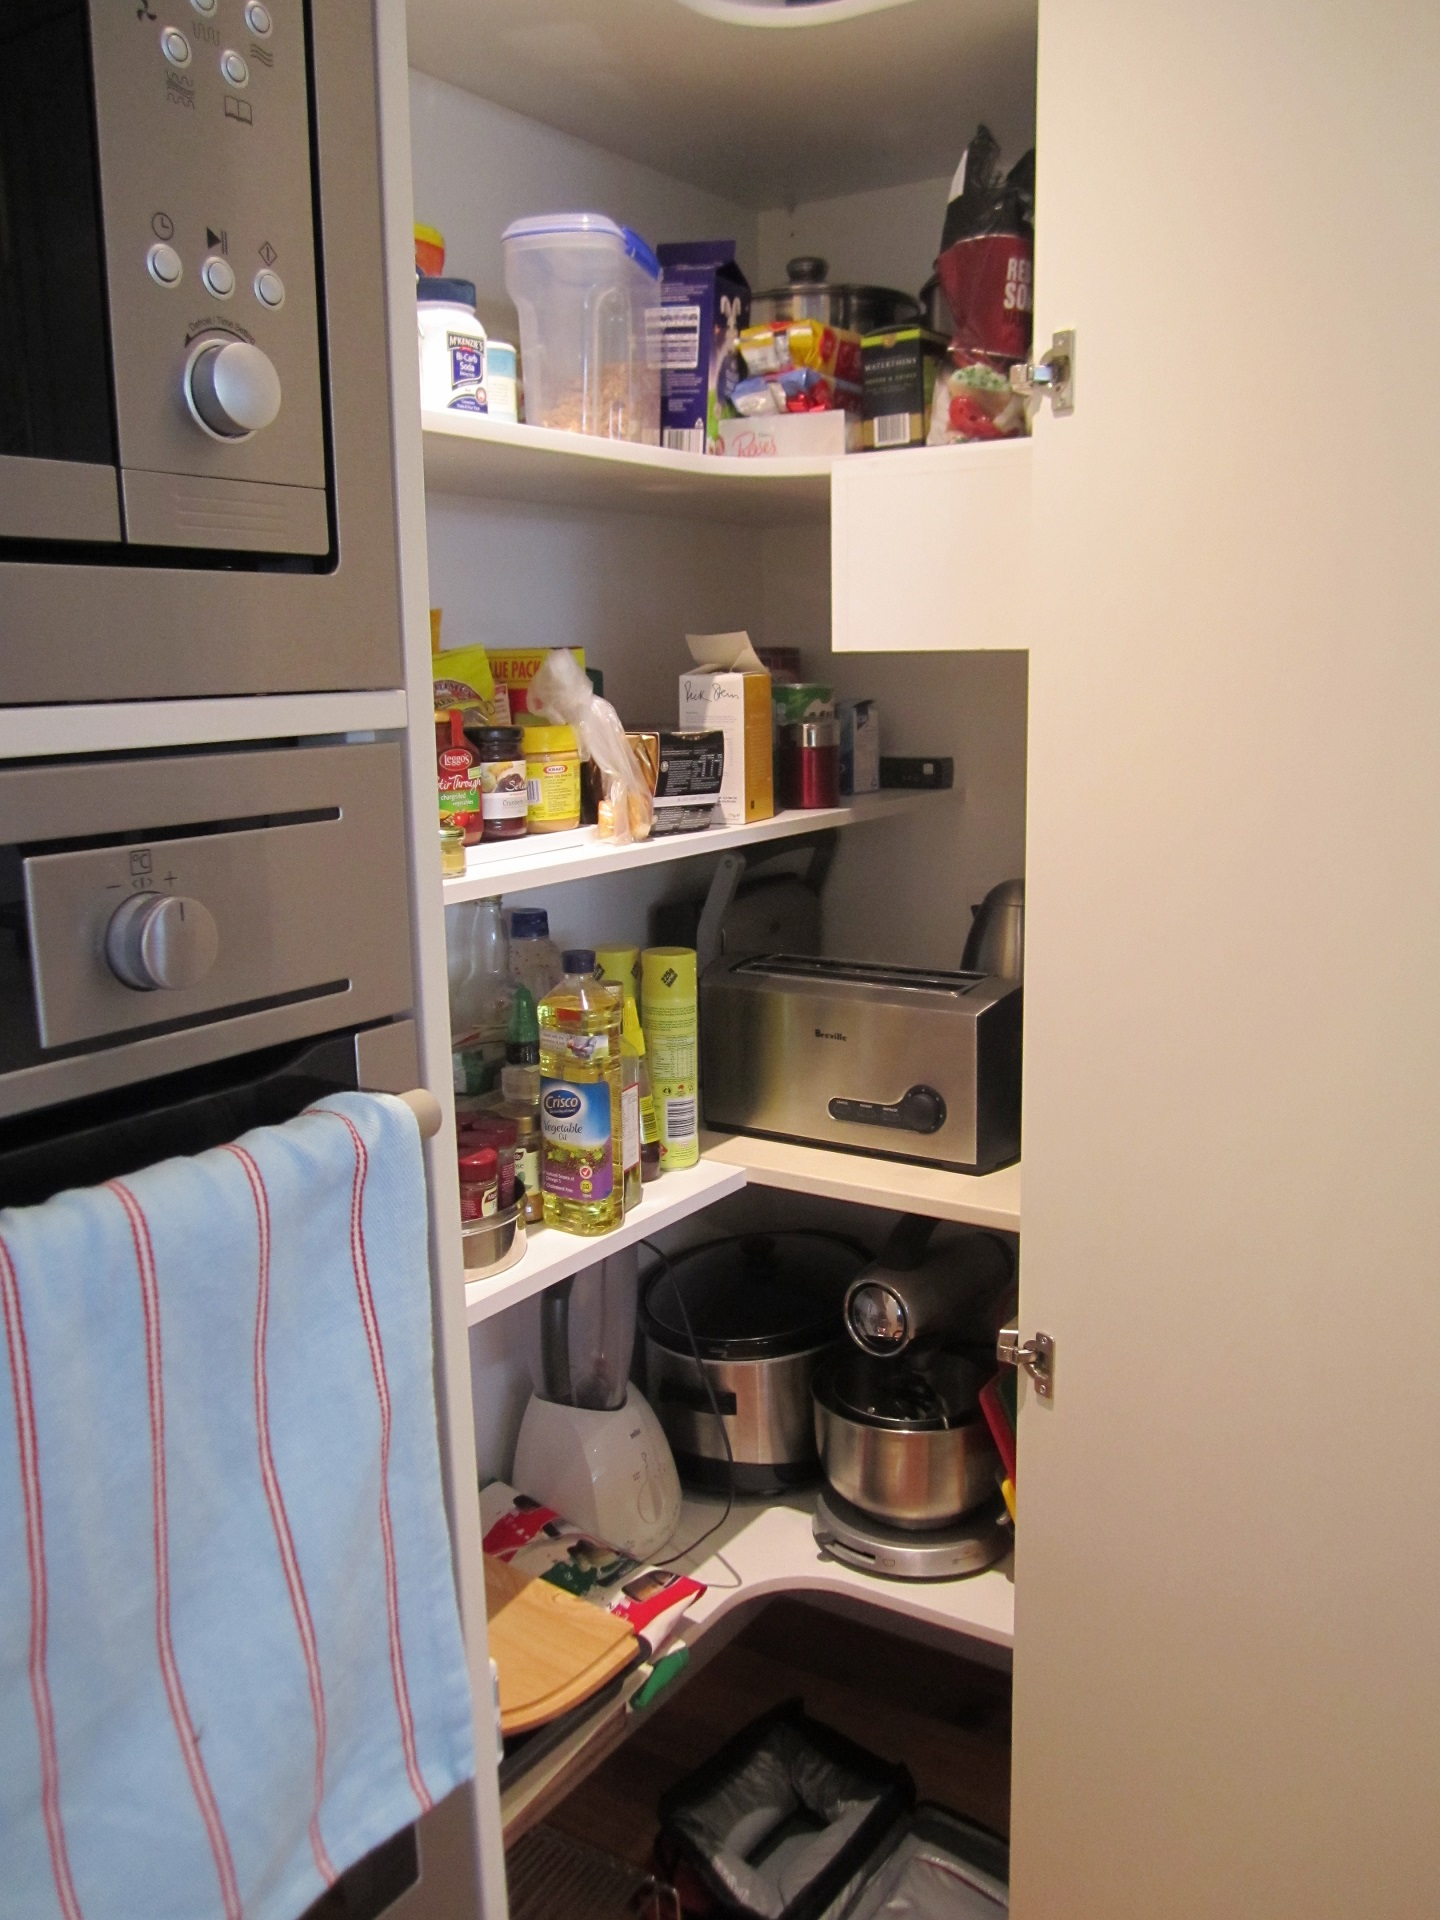 Brisbane Kitchen Design Sydney St Camp Hill Traditional Kitchen Renovation Corner Pantry Internal5